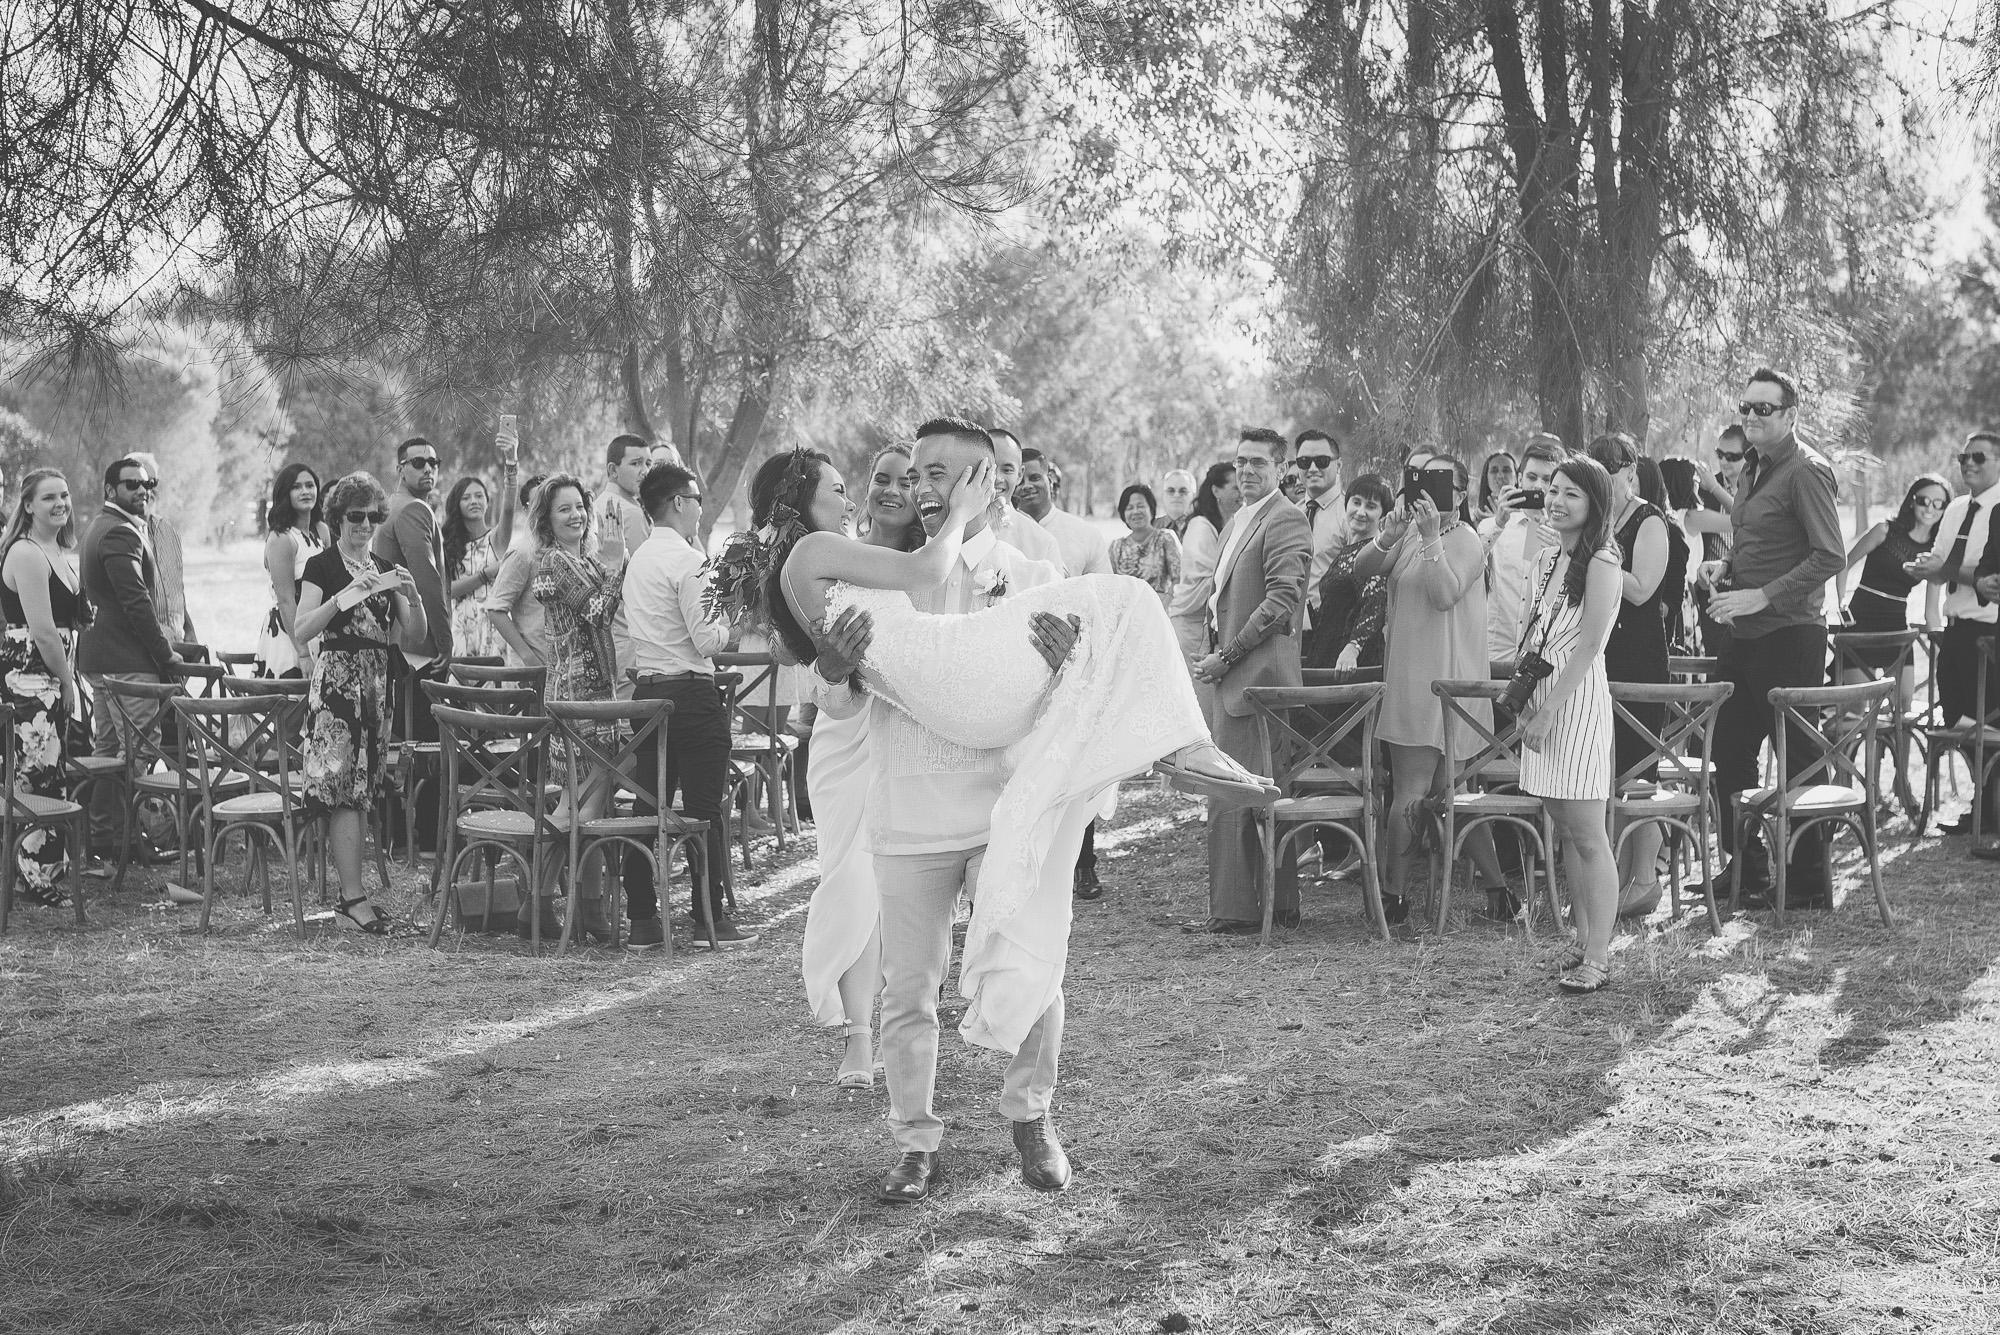 wedding-photographer-outdoor-casual-styled-los-angeles-australia-california-international-earthbound -49.jpg